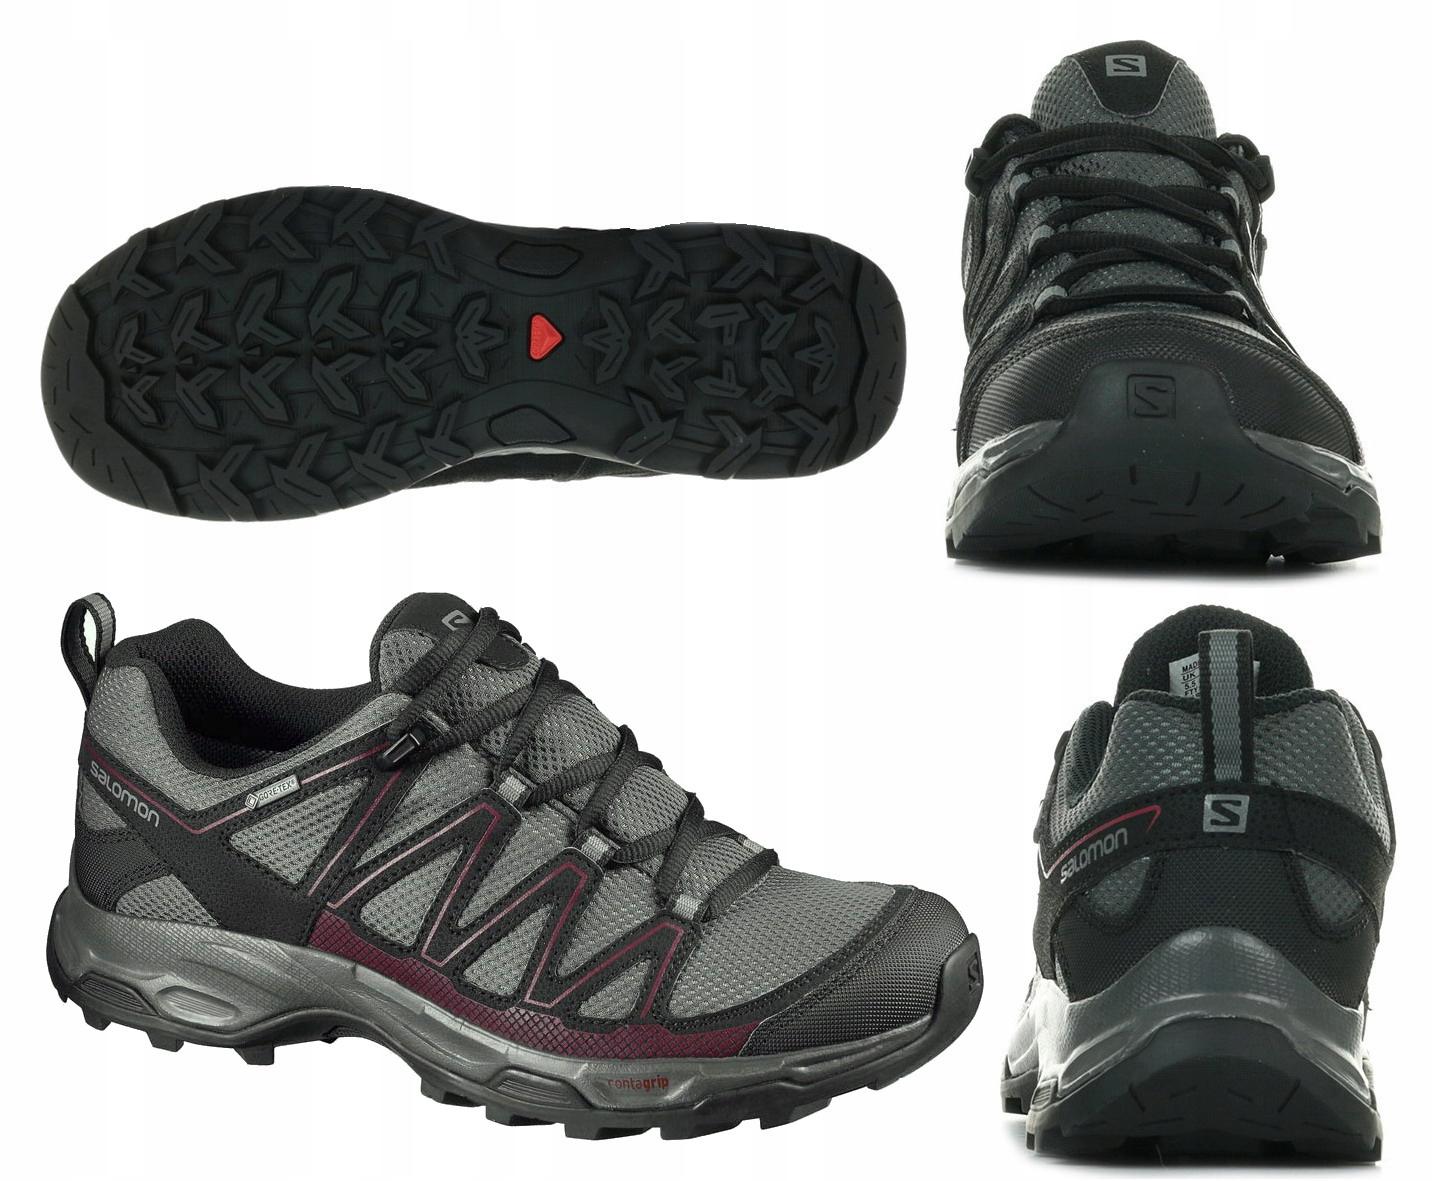 Salomon Wentwood GTX buty trekking damskie 38 2/3